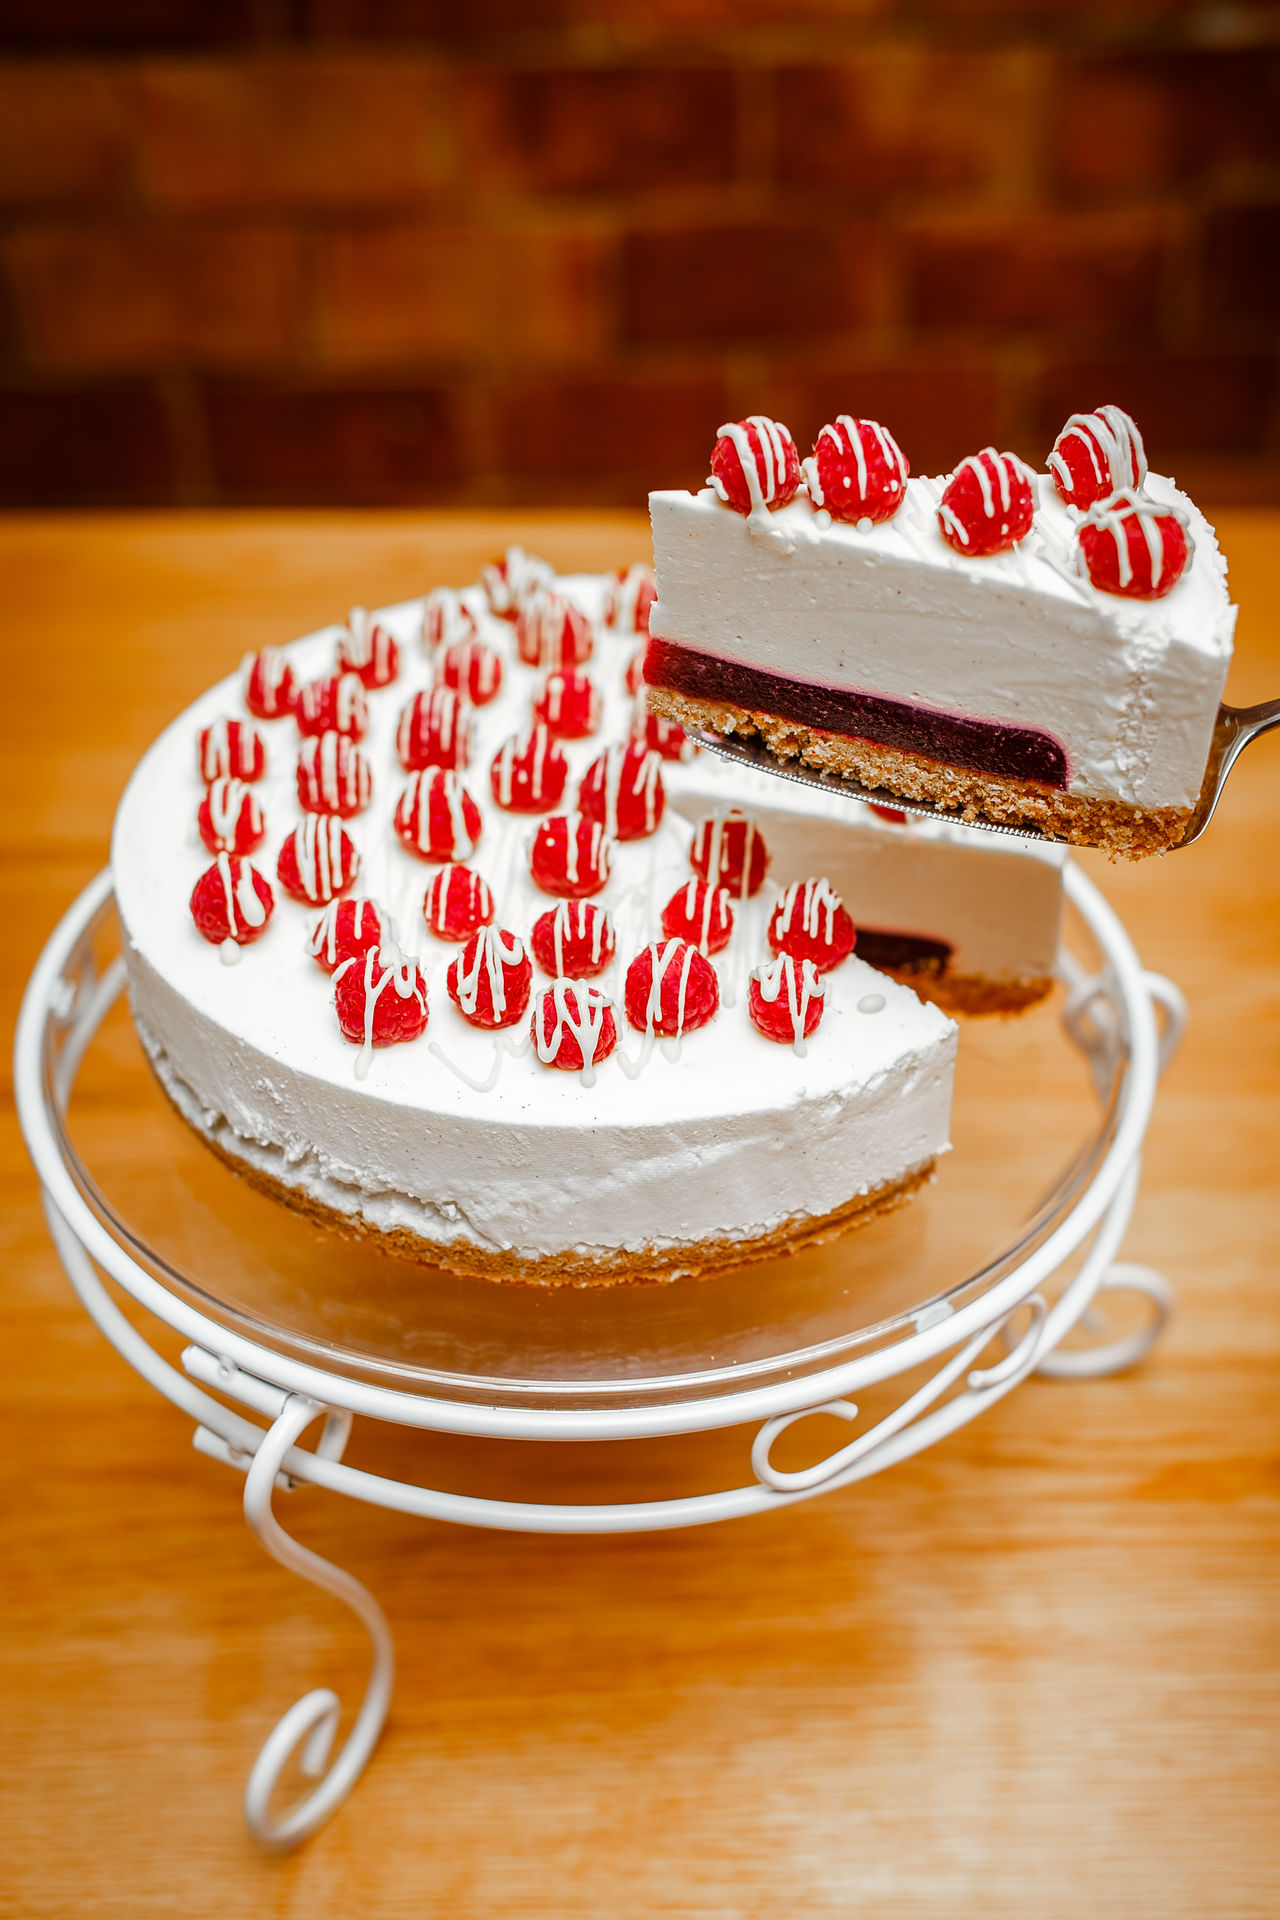 Beautiful stock photos of geburtstagskuchen,  Birthday Cake,  Cake,  Cakestand,  Celebration